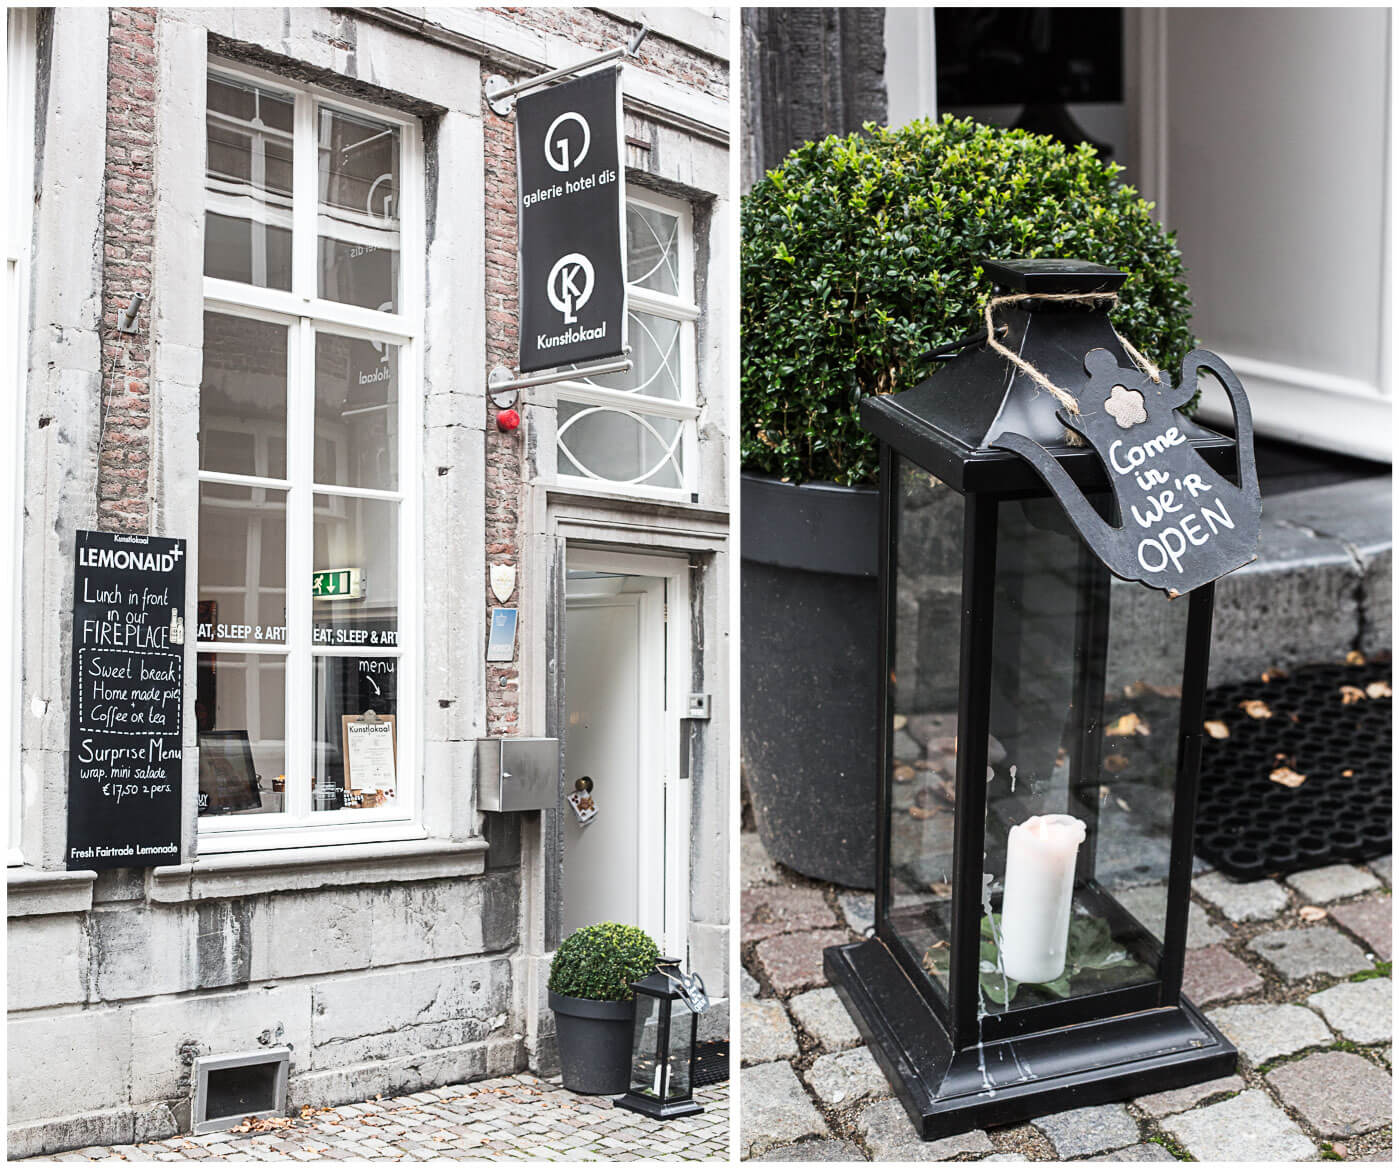 Galerie Hotel Dis Maastricht Boeken Looking For Booking